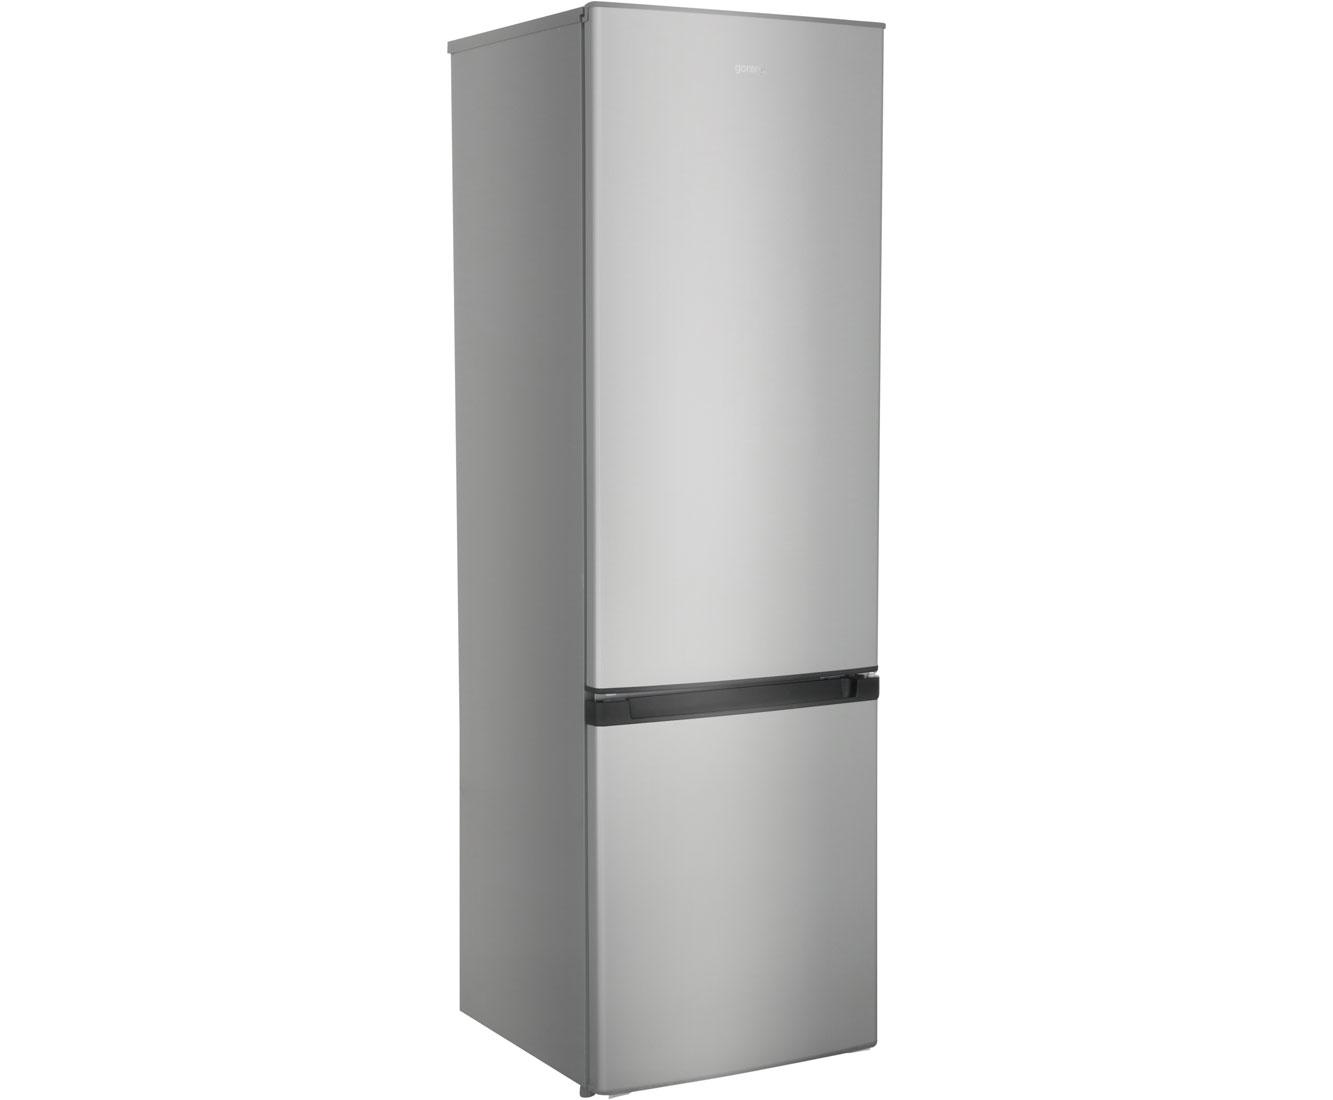 Gorenje Kühlschrank Erfahrung : Gorenje rk anx kühl gefrierkombination edelstahl optik a